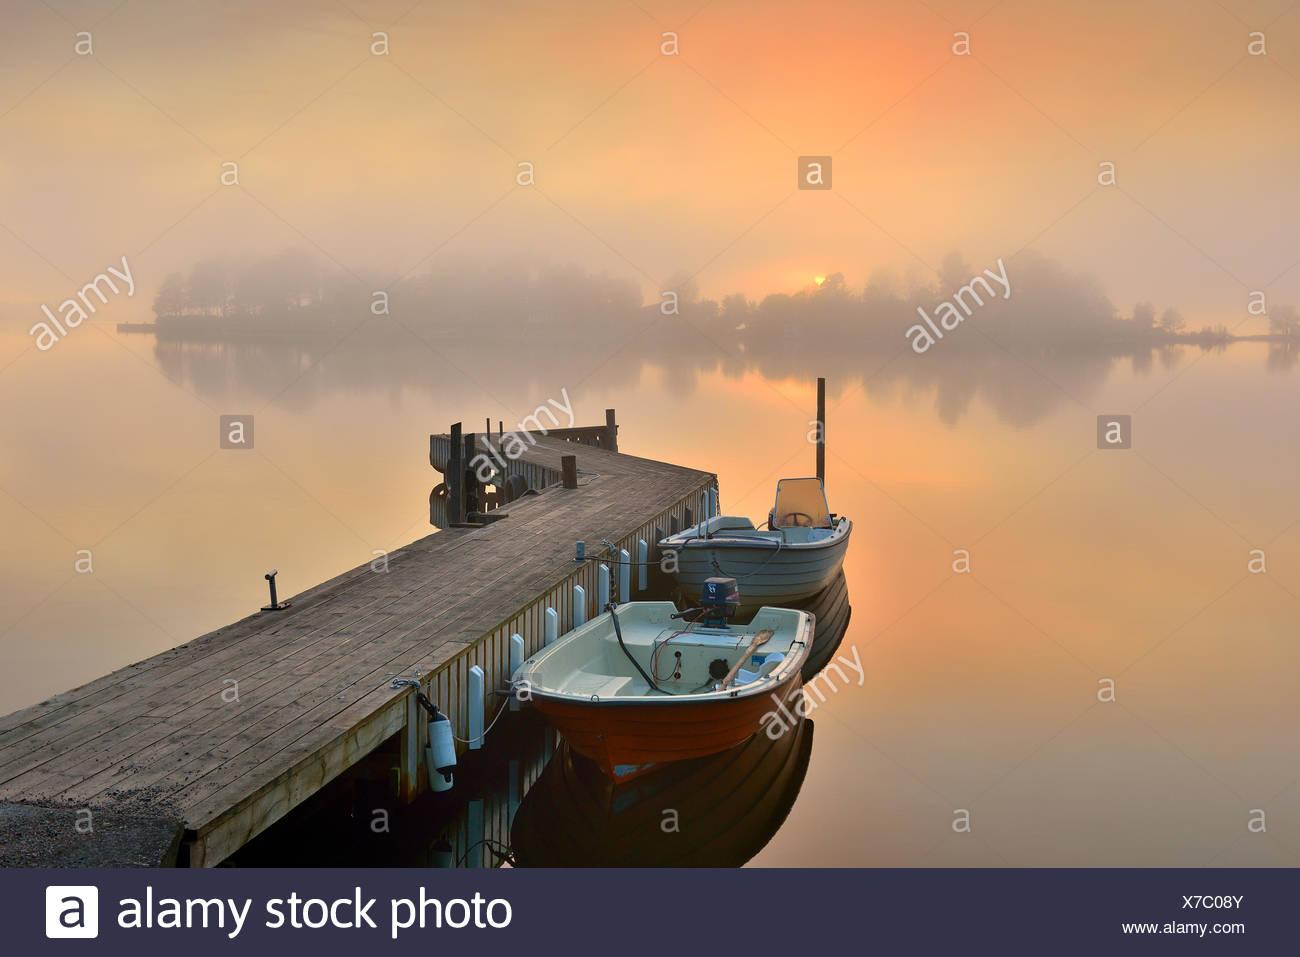 Sweden, Stockholm Archipelago, Uppland, Lidingo, Jetty and anchored boat at foggy dawn - Stock Image